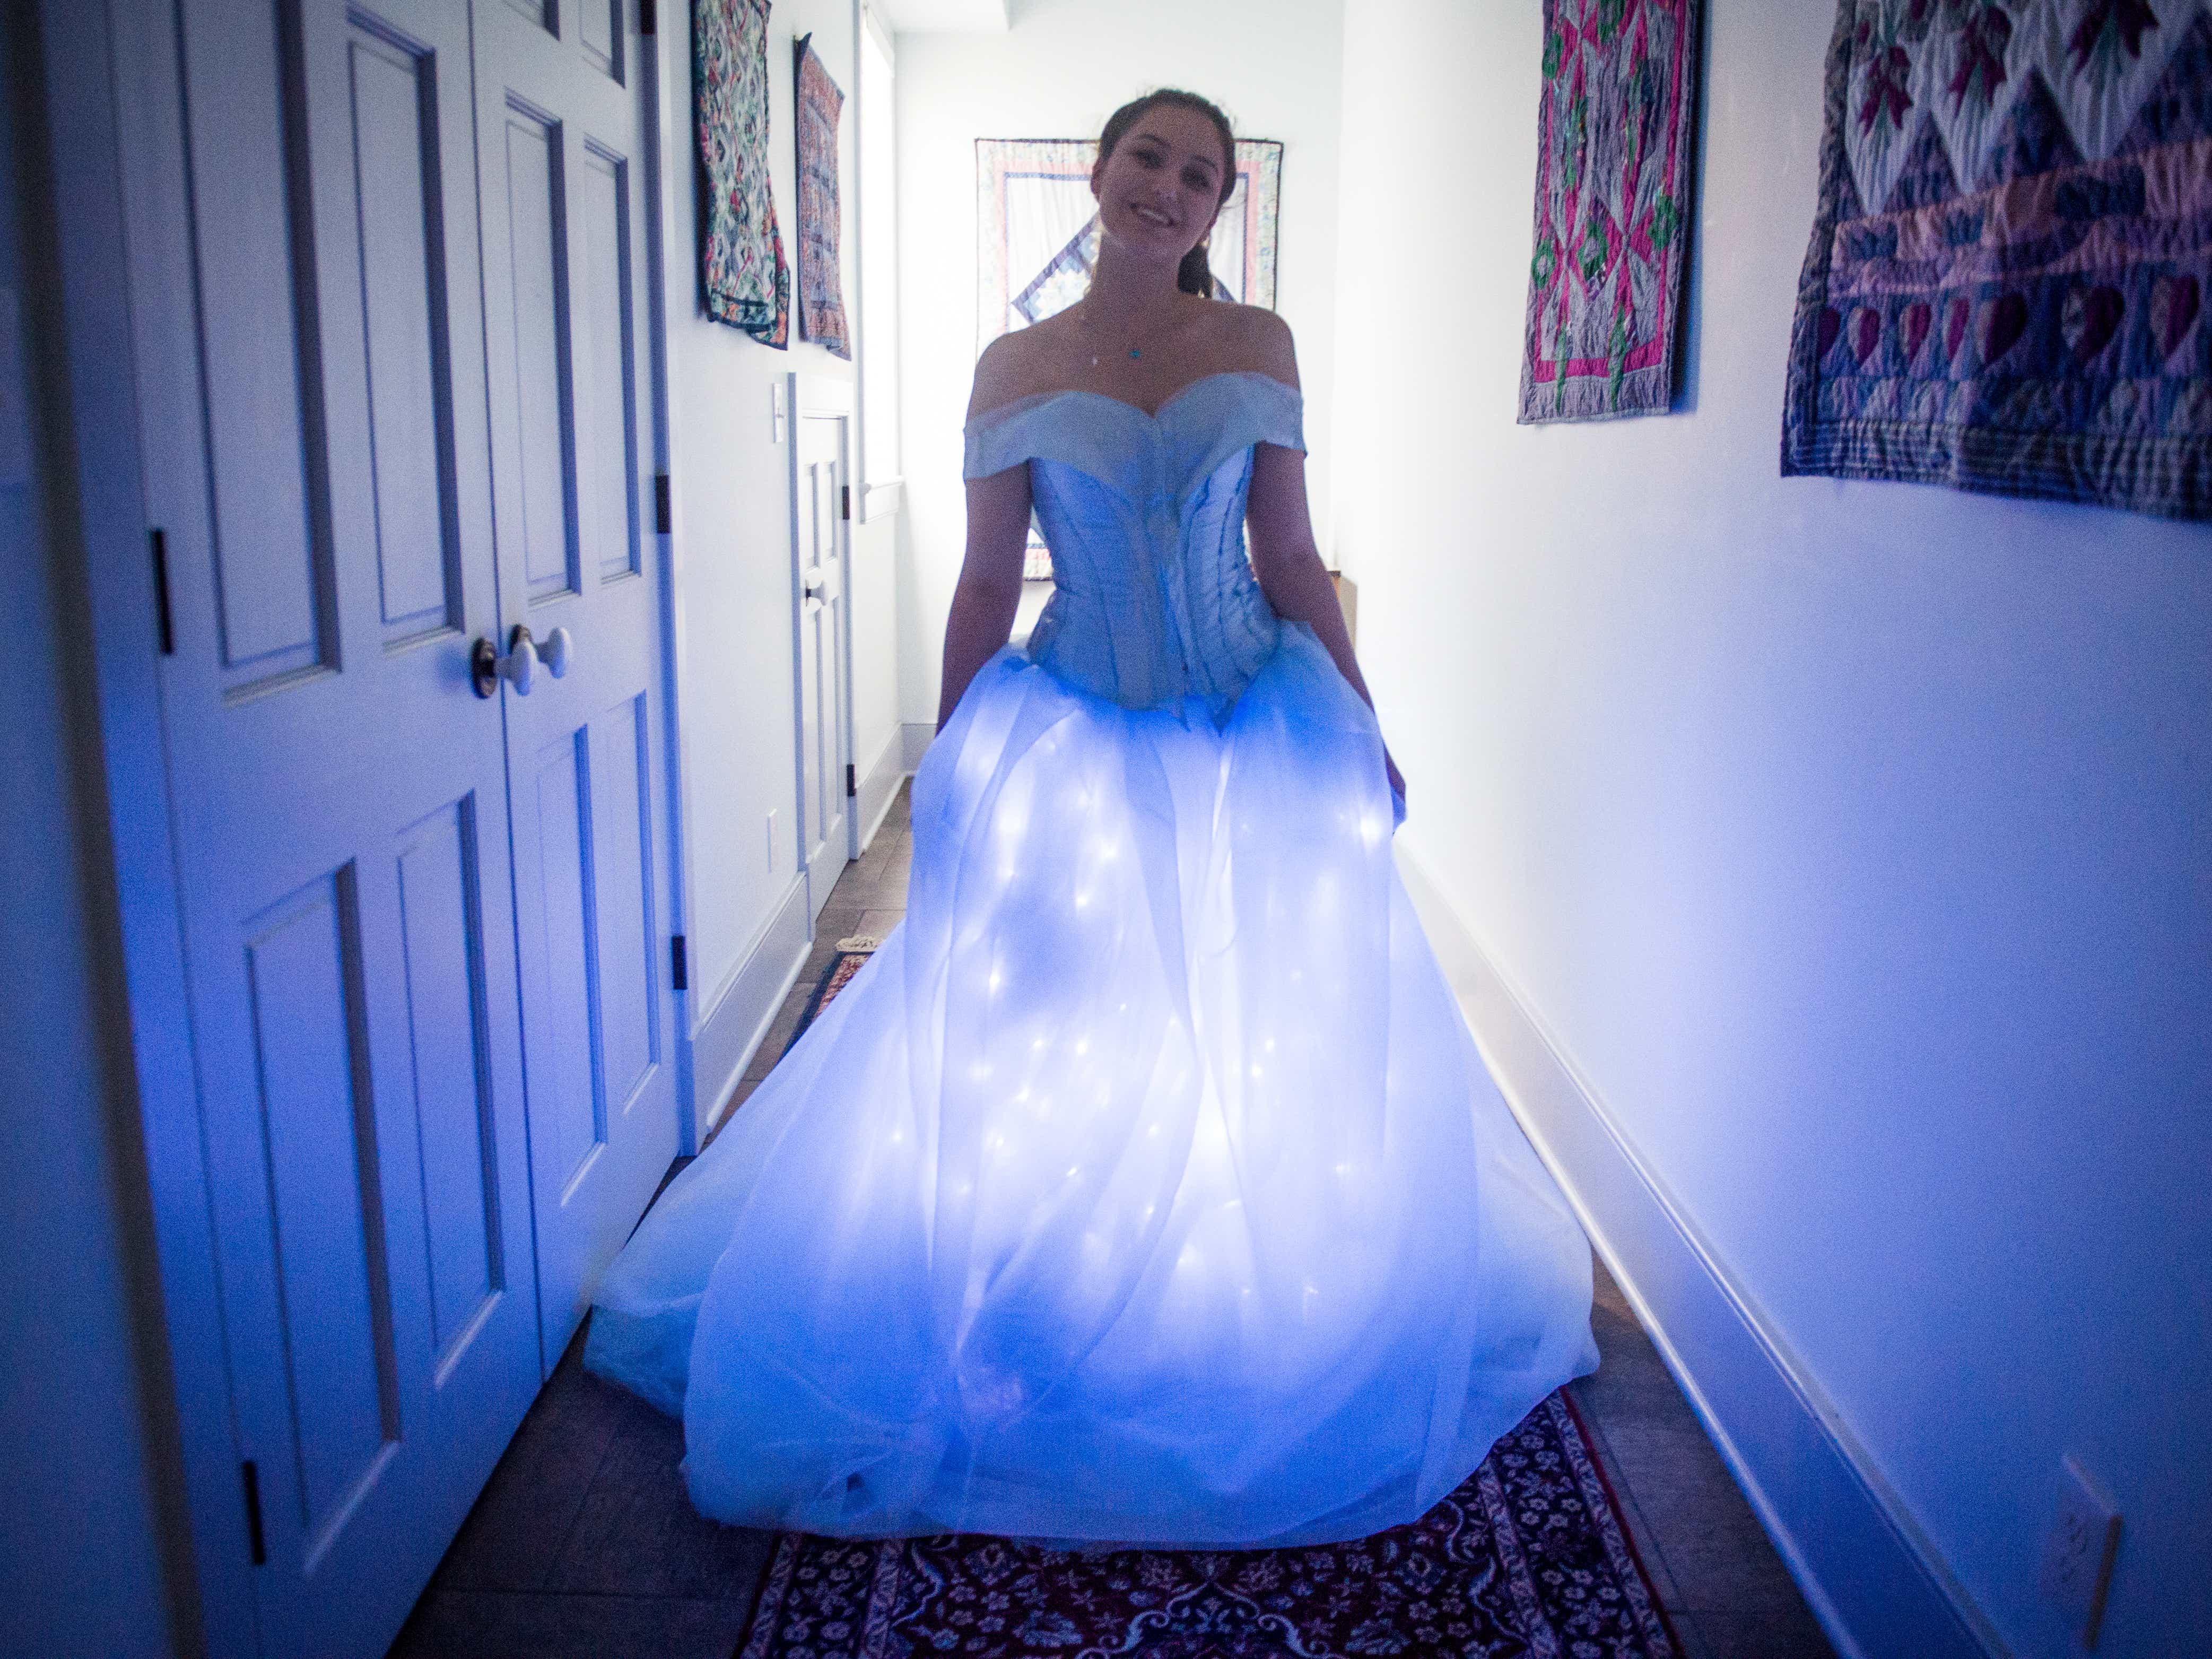 614fbd5d6c West High student creates dream Cinderella prom dress